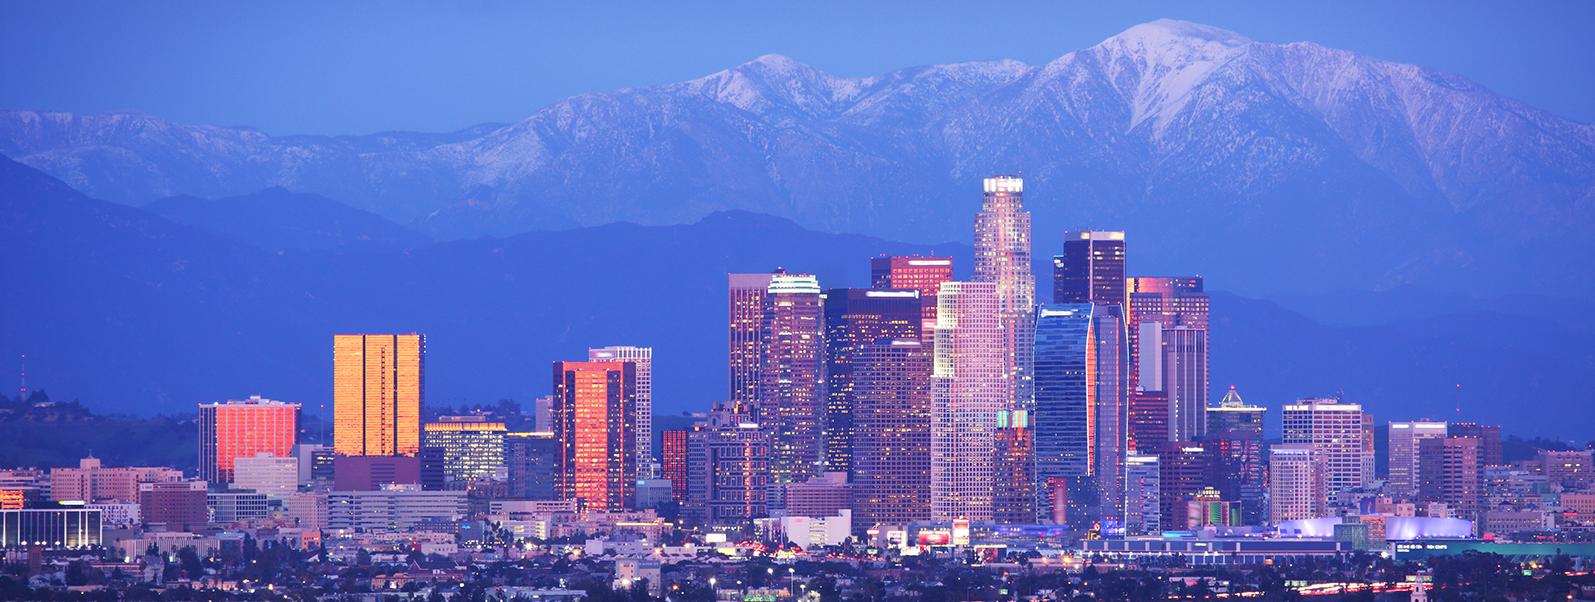 LA-skyline-cvent-size-1595w